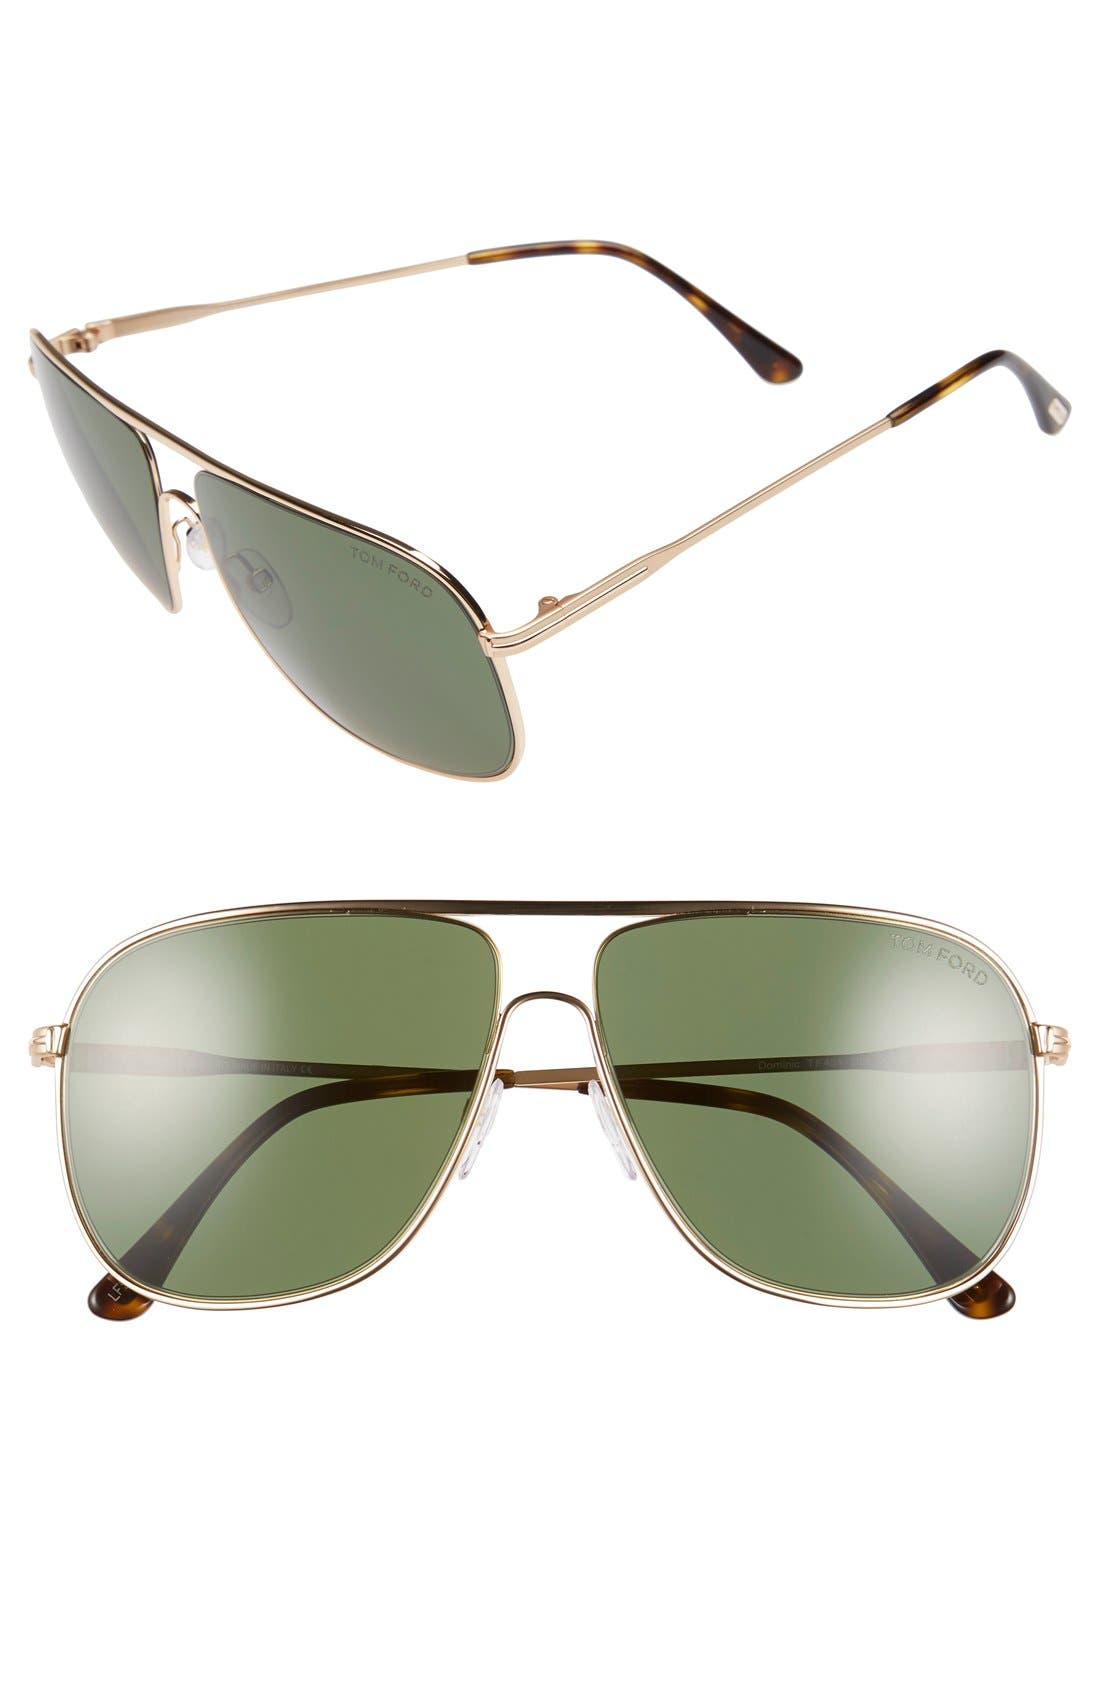 TOM FORD 'Dominic' 60mm Aviator Sunglasses